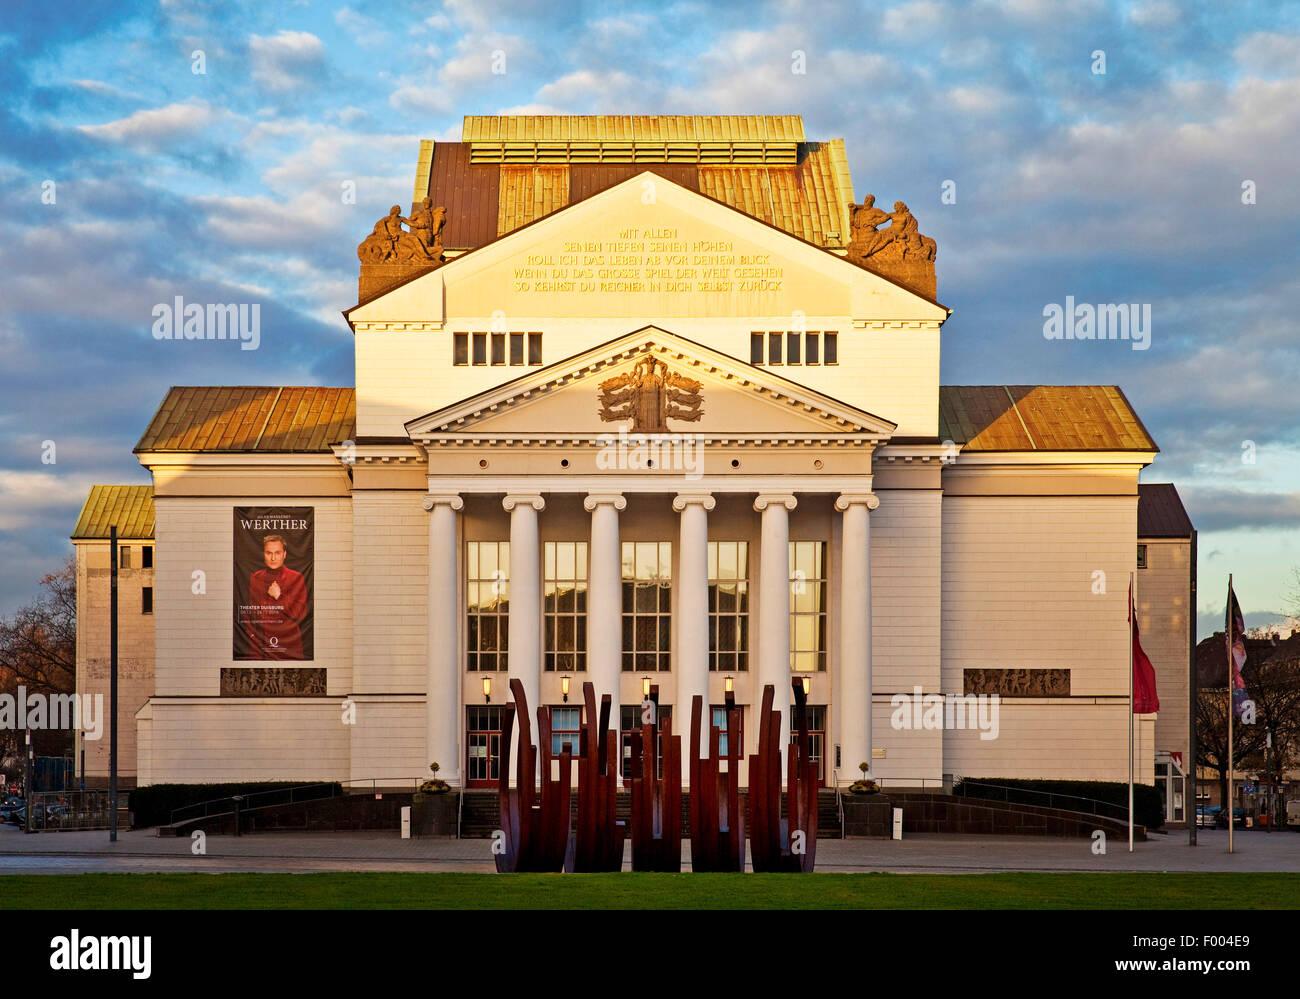 Duisburg Theatre, Germany, North Rhine-Westphalia, Ruhr Area, Duisburg - Stock Image